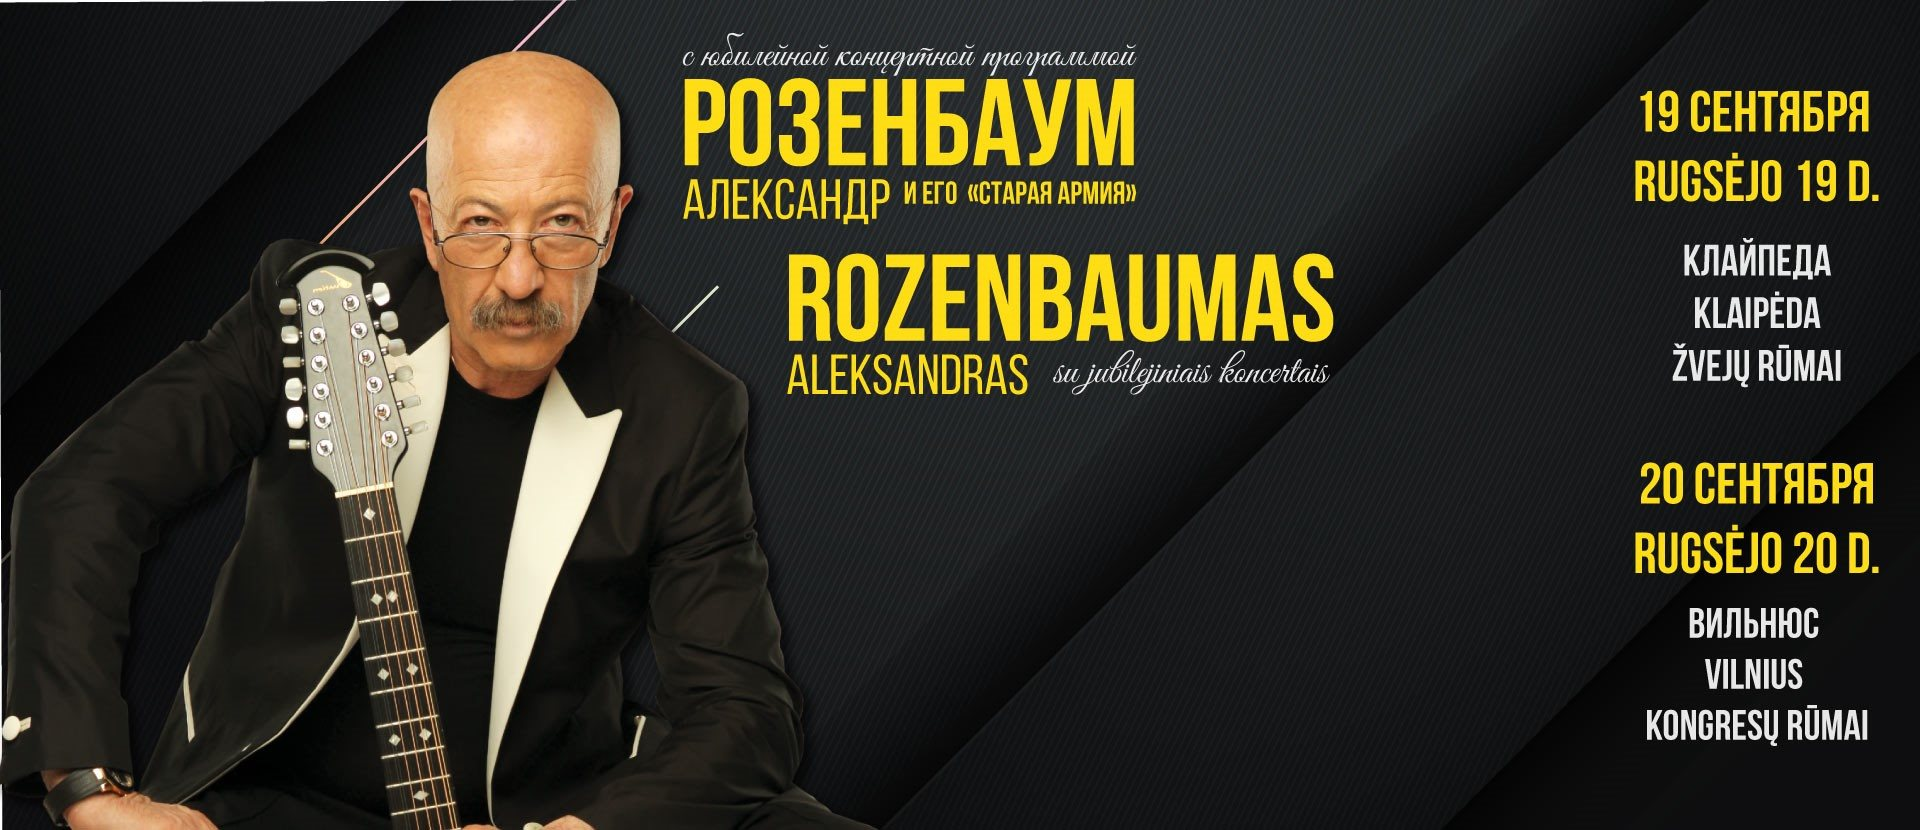 Aleksandras Rozenbaumas / Александр Розенбаум